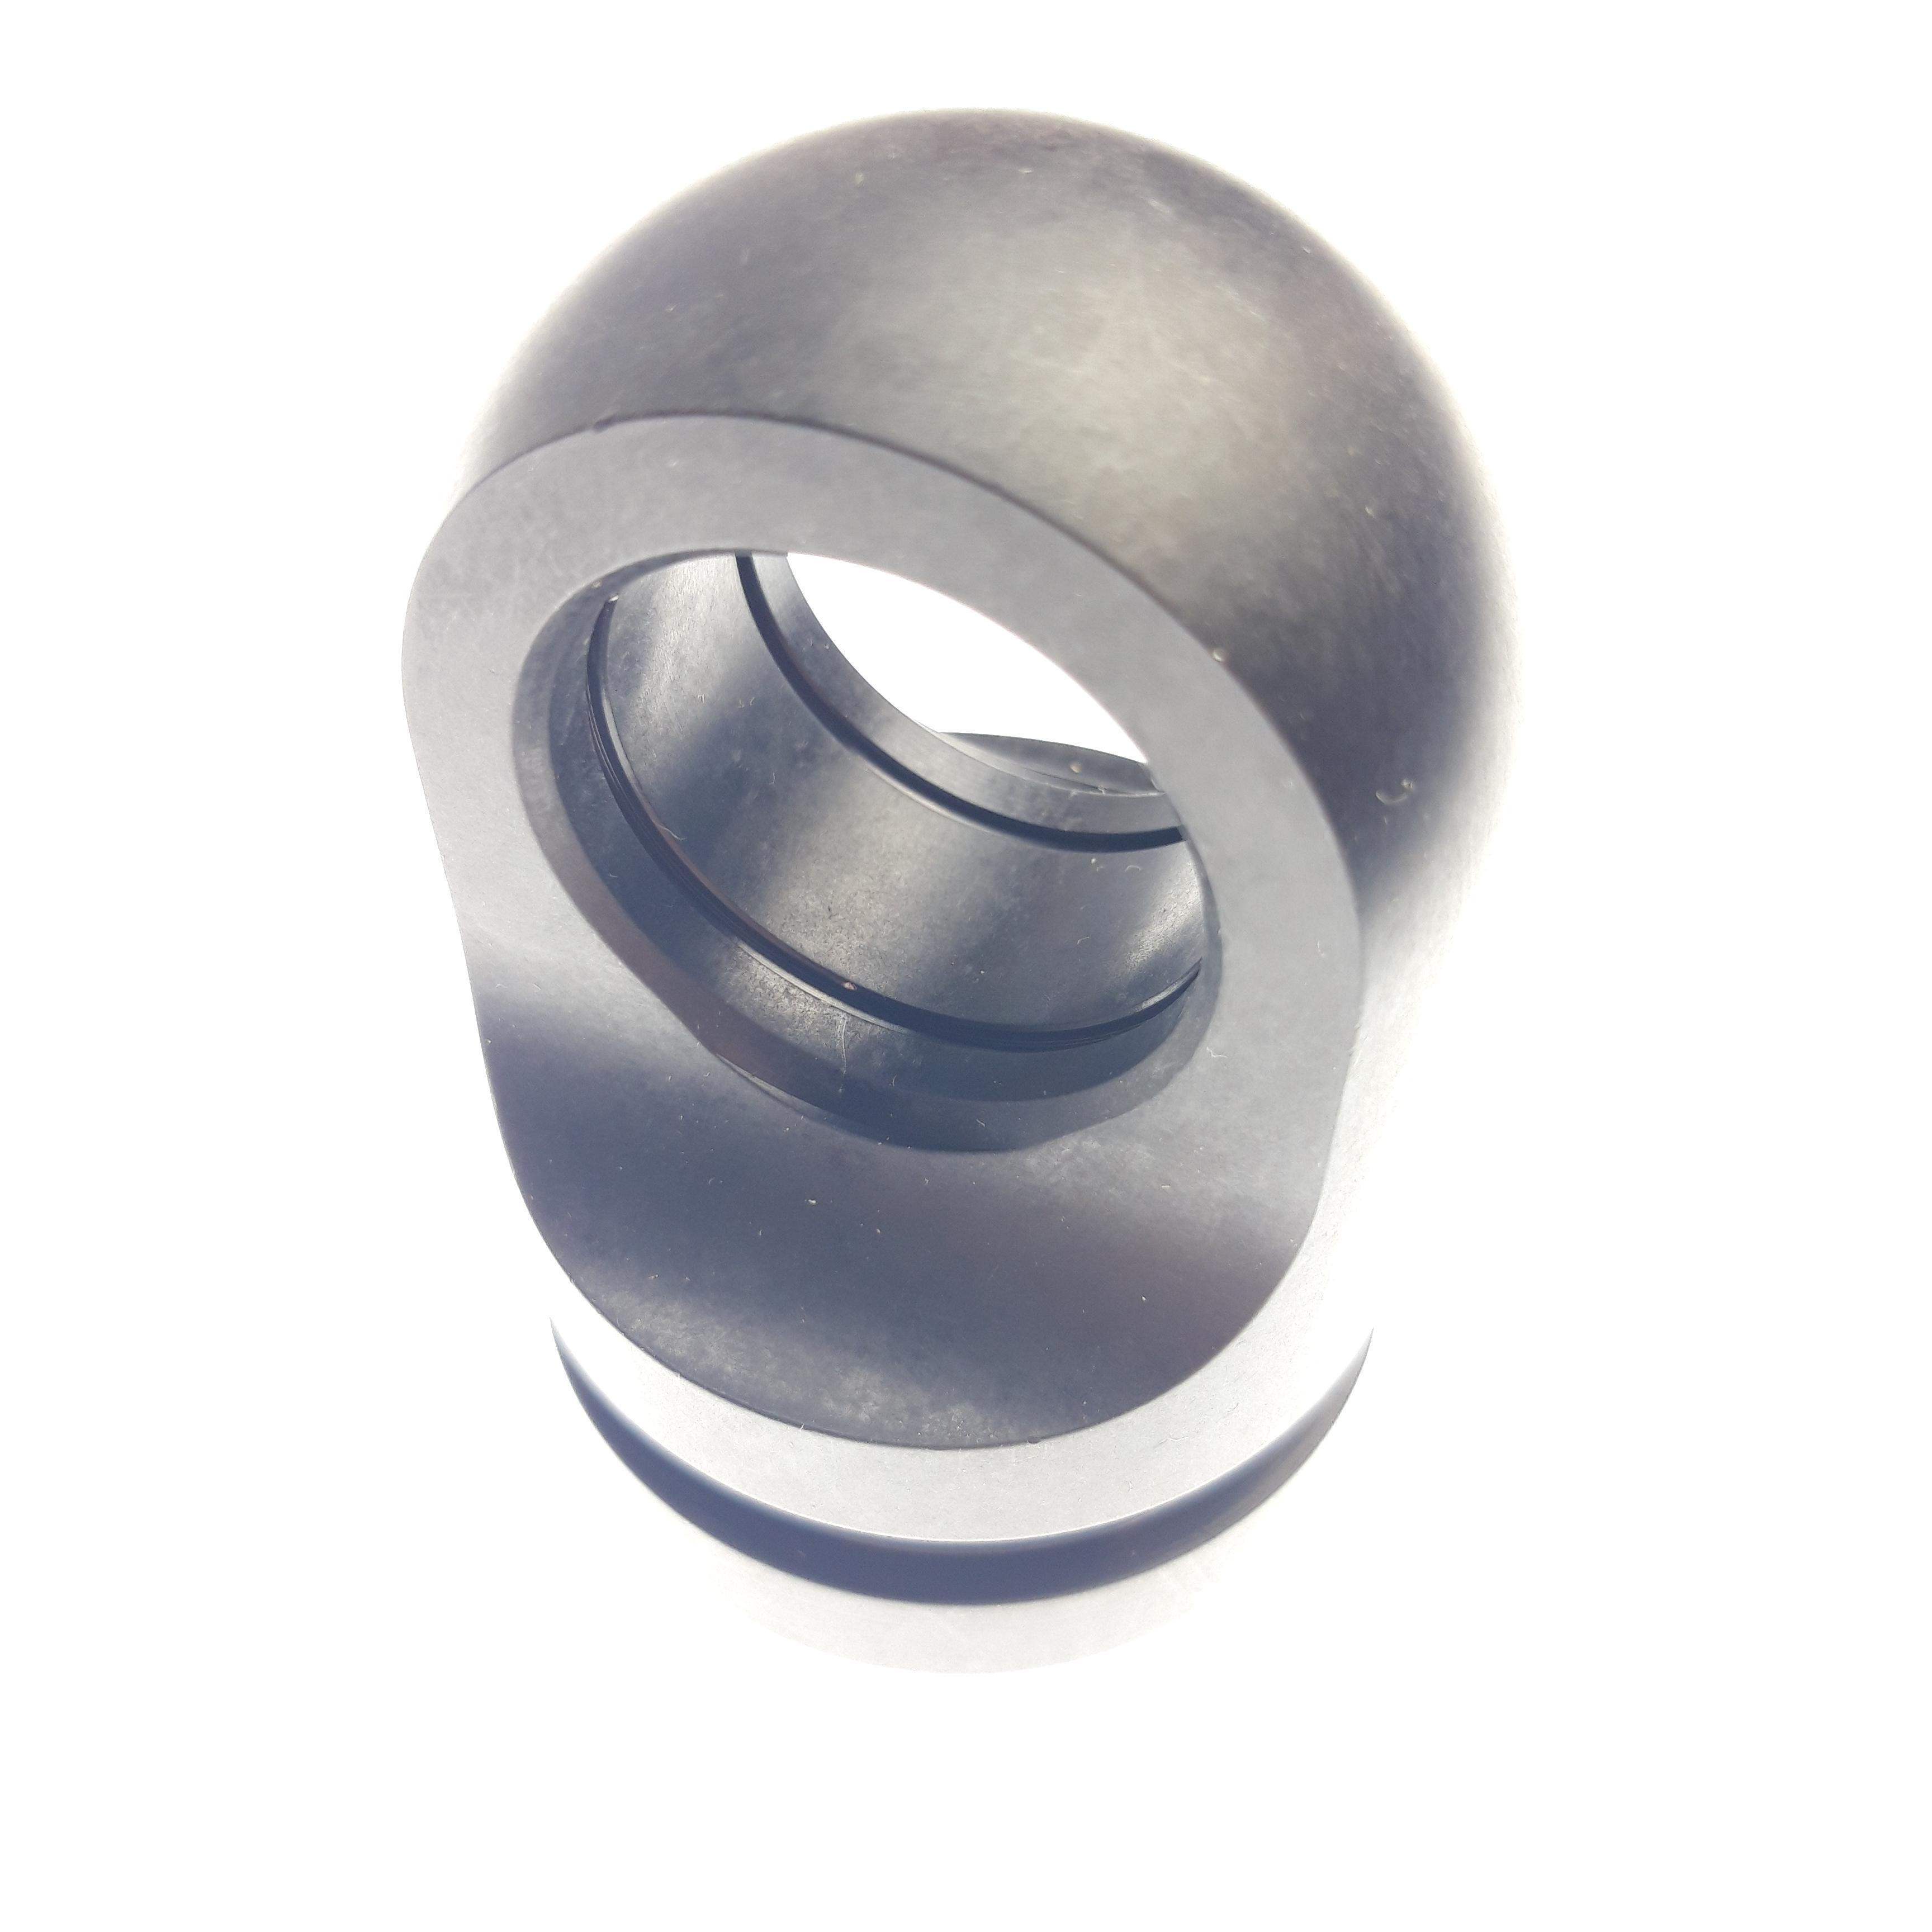 Eyelet Parts: Eyelet, Shaft (0.875 Shaft,1.00 W,2.942 TLG,1.1869 ID) AI6061,Blk